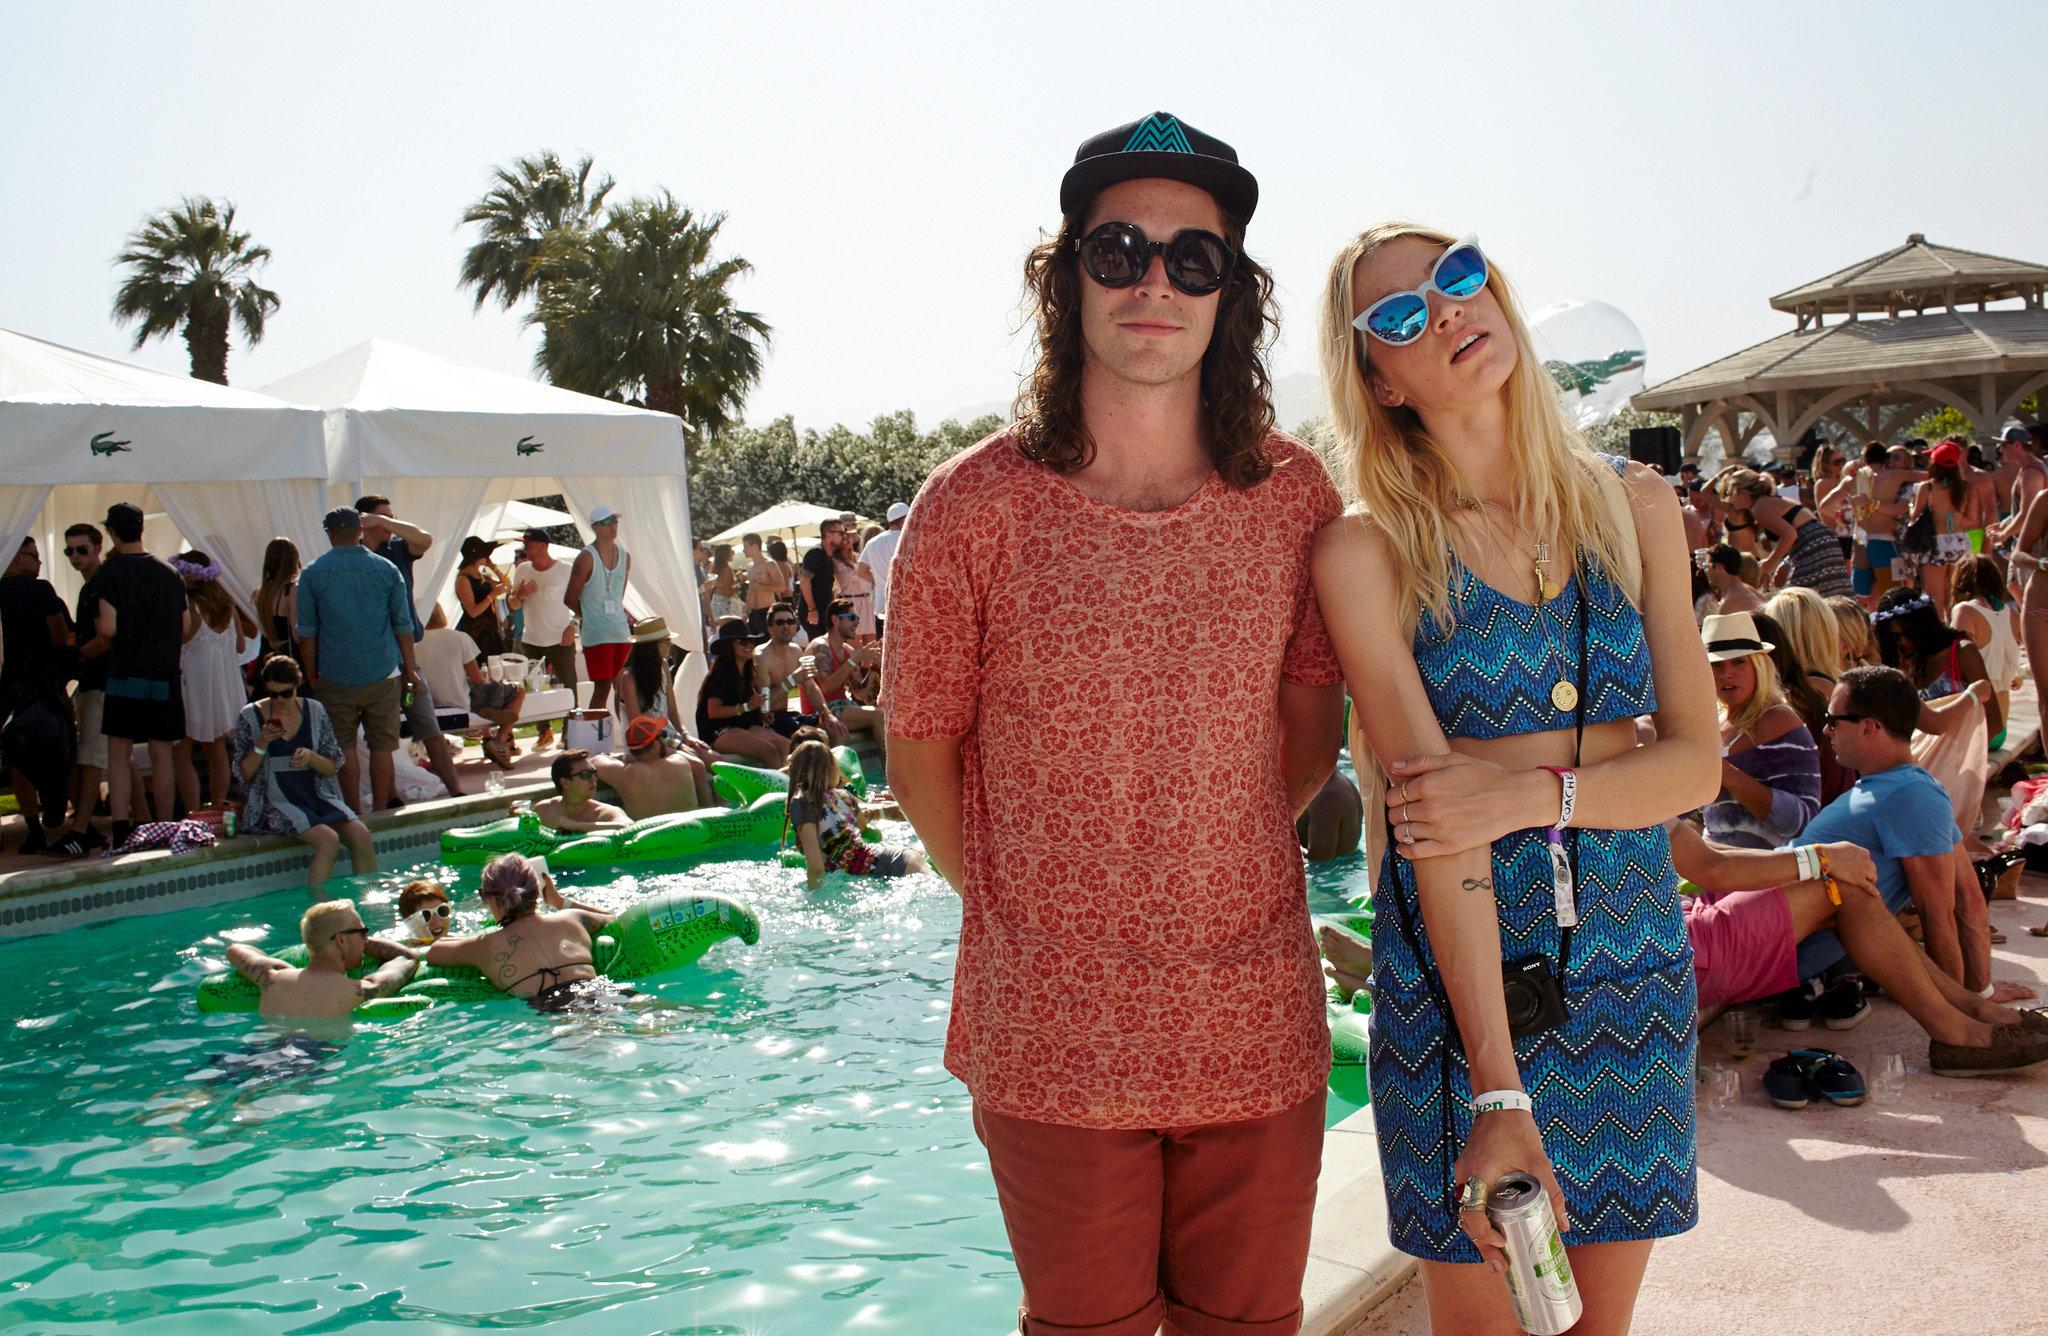 Sam Martin & Female Friend